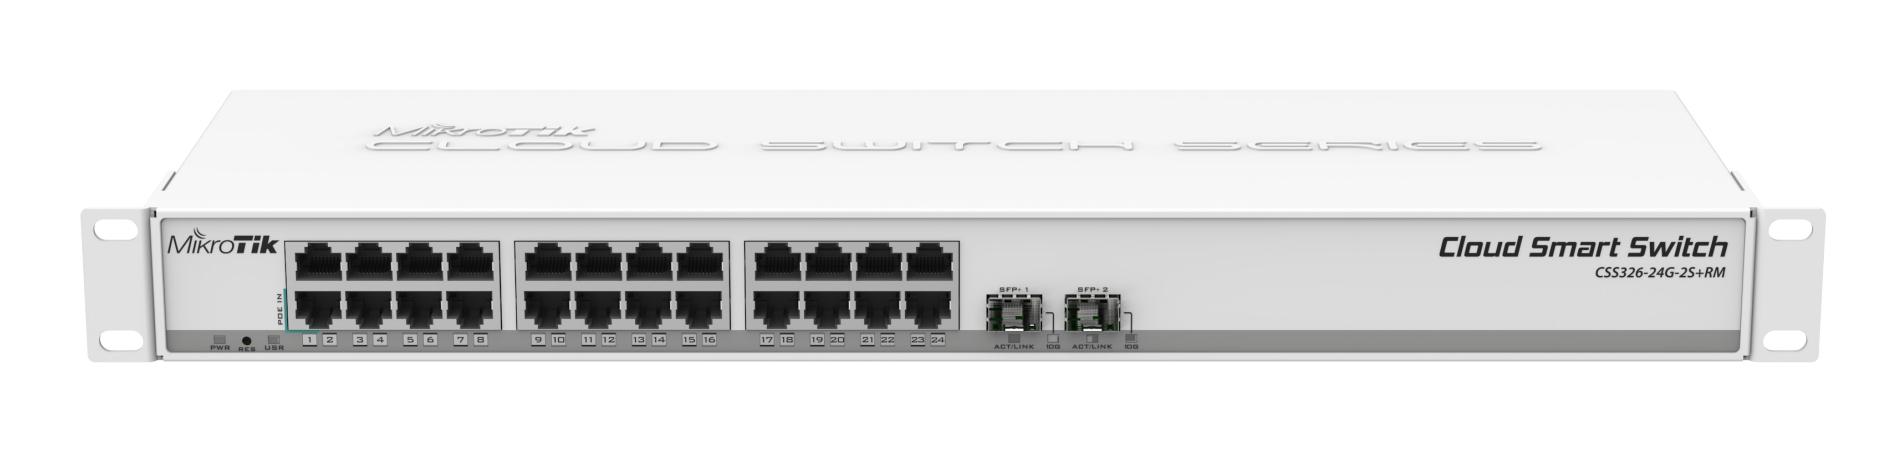 Cloud Smart Switch 326-24G-2S+RM/ MikroTik